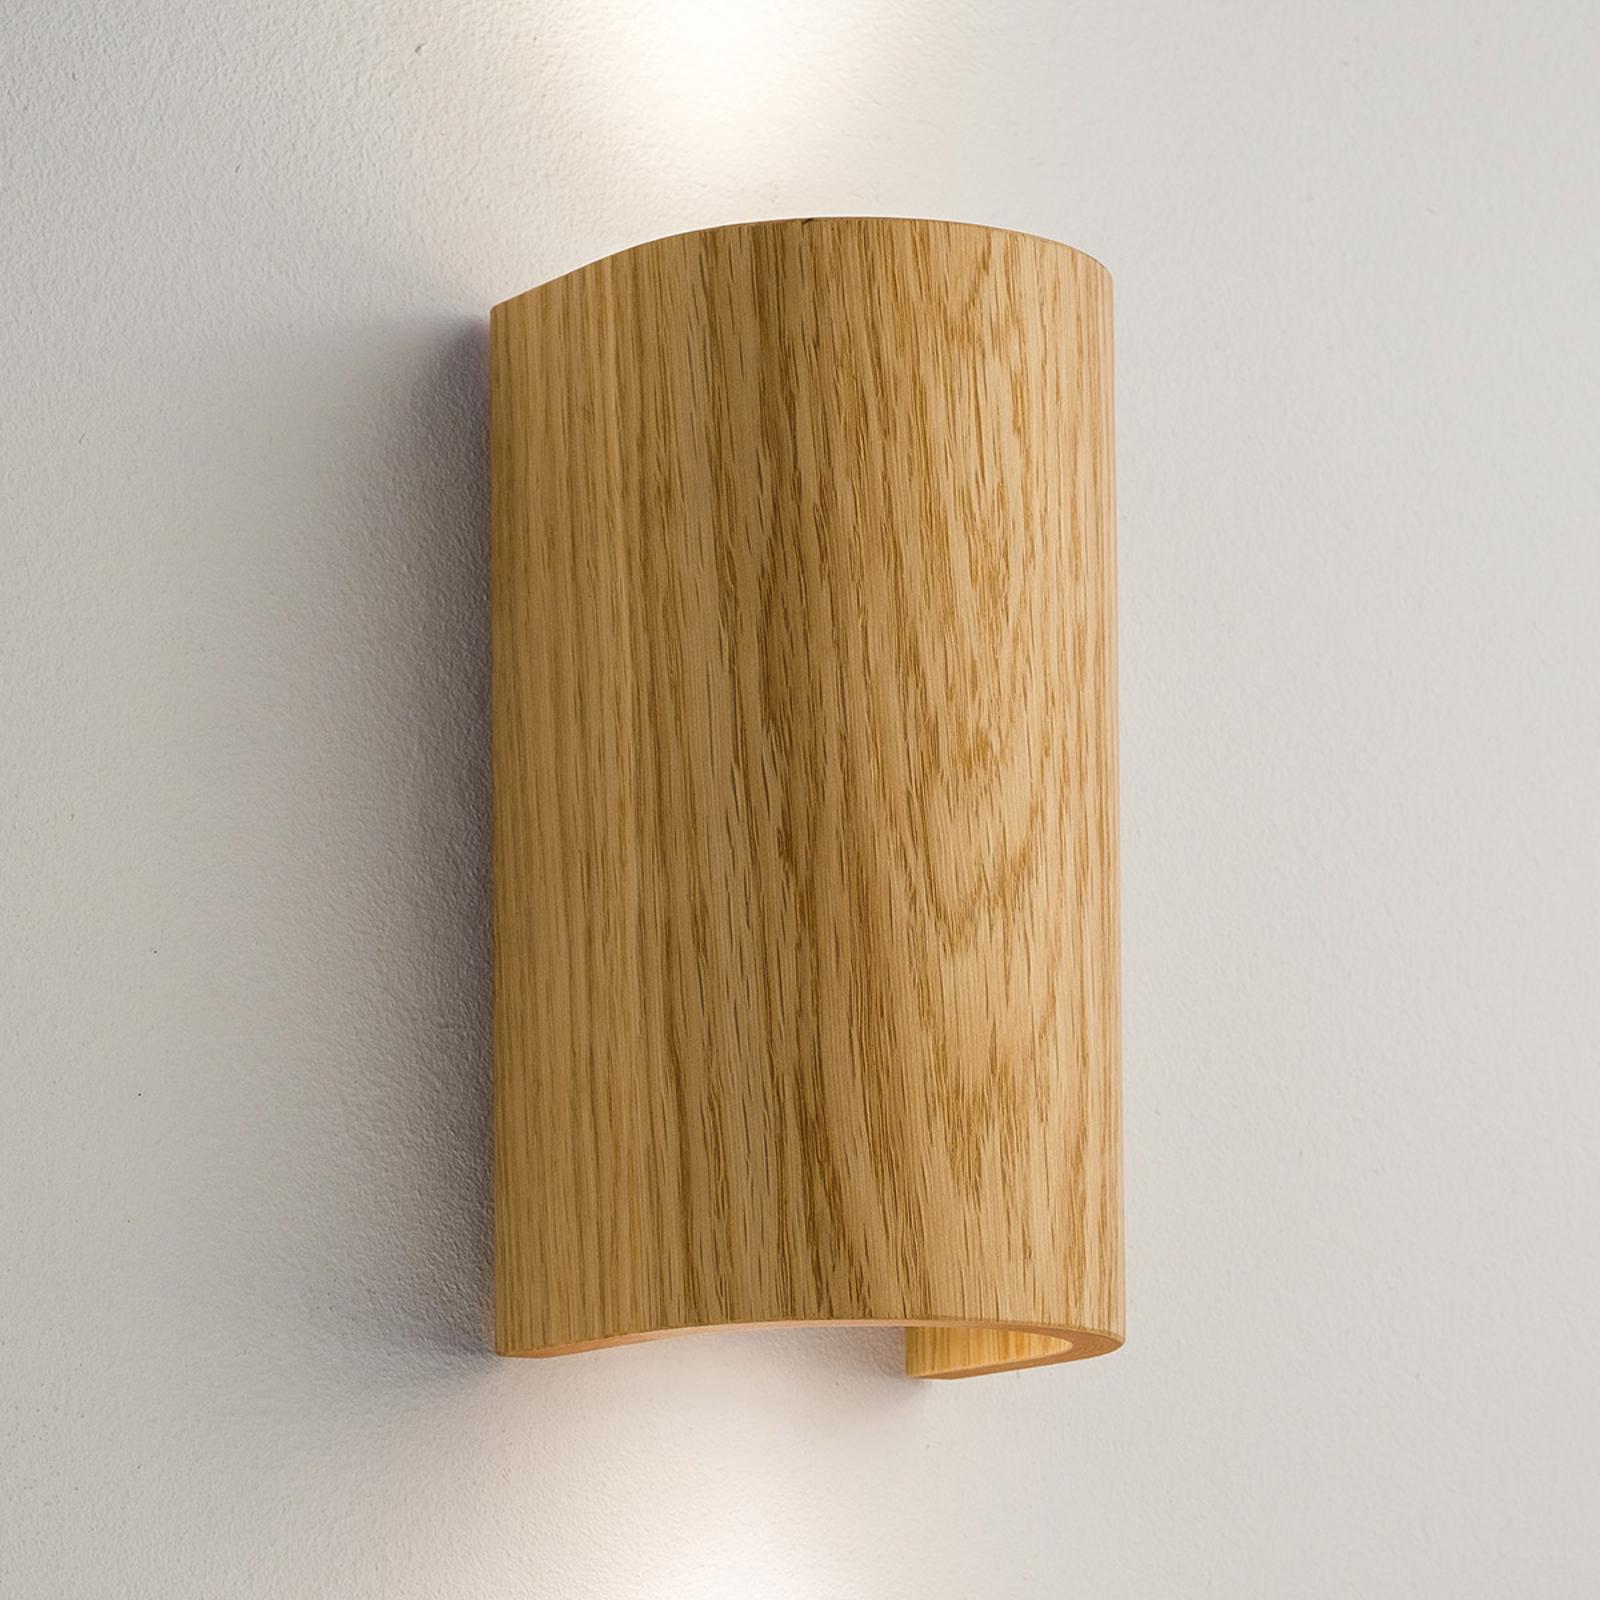 Applique Tube rovere 17,5 cm